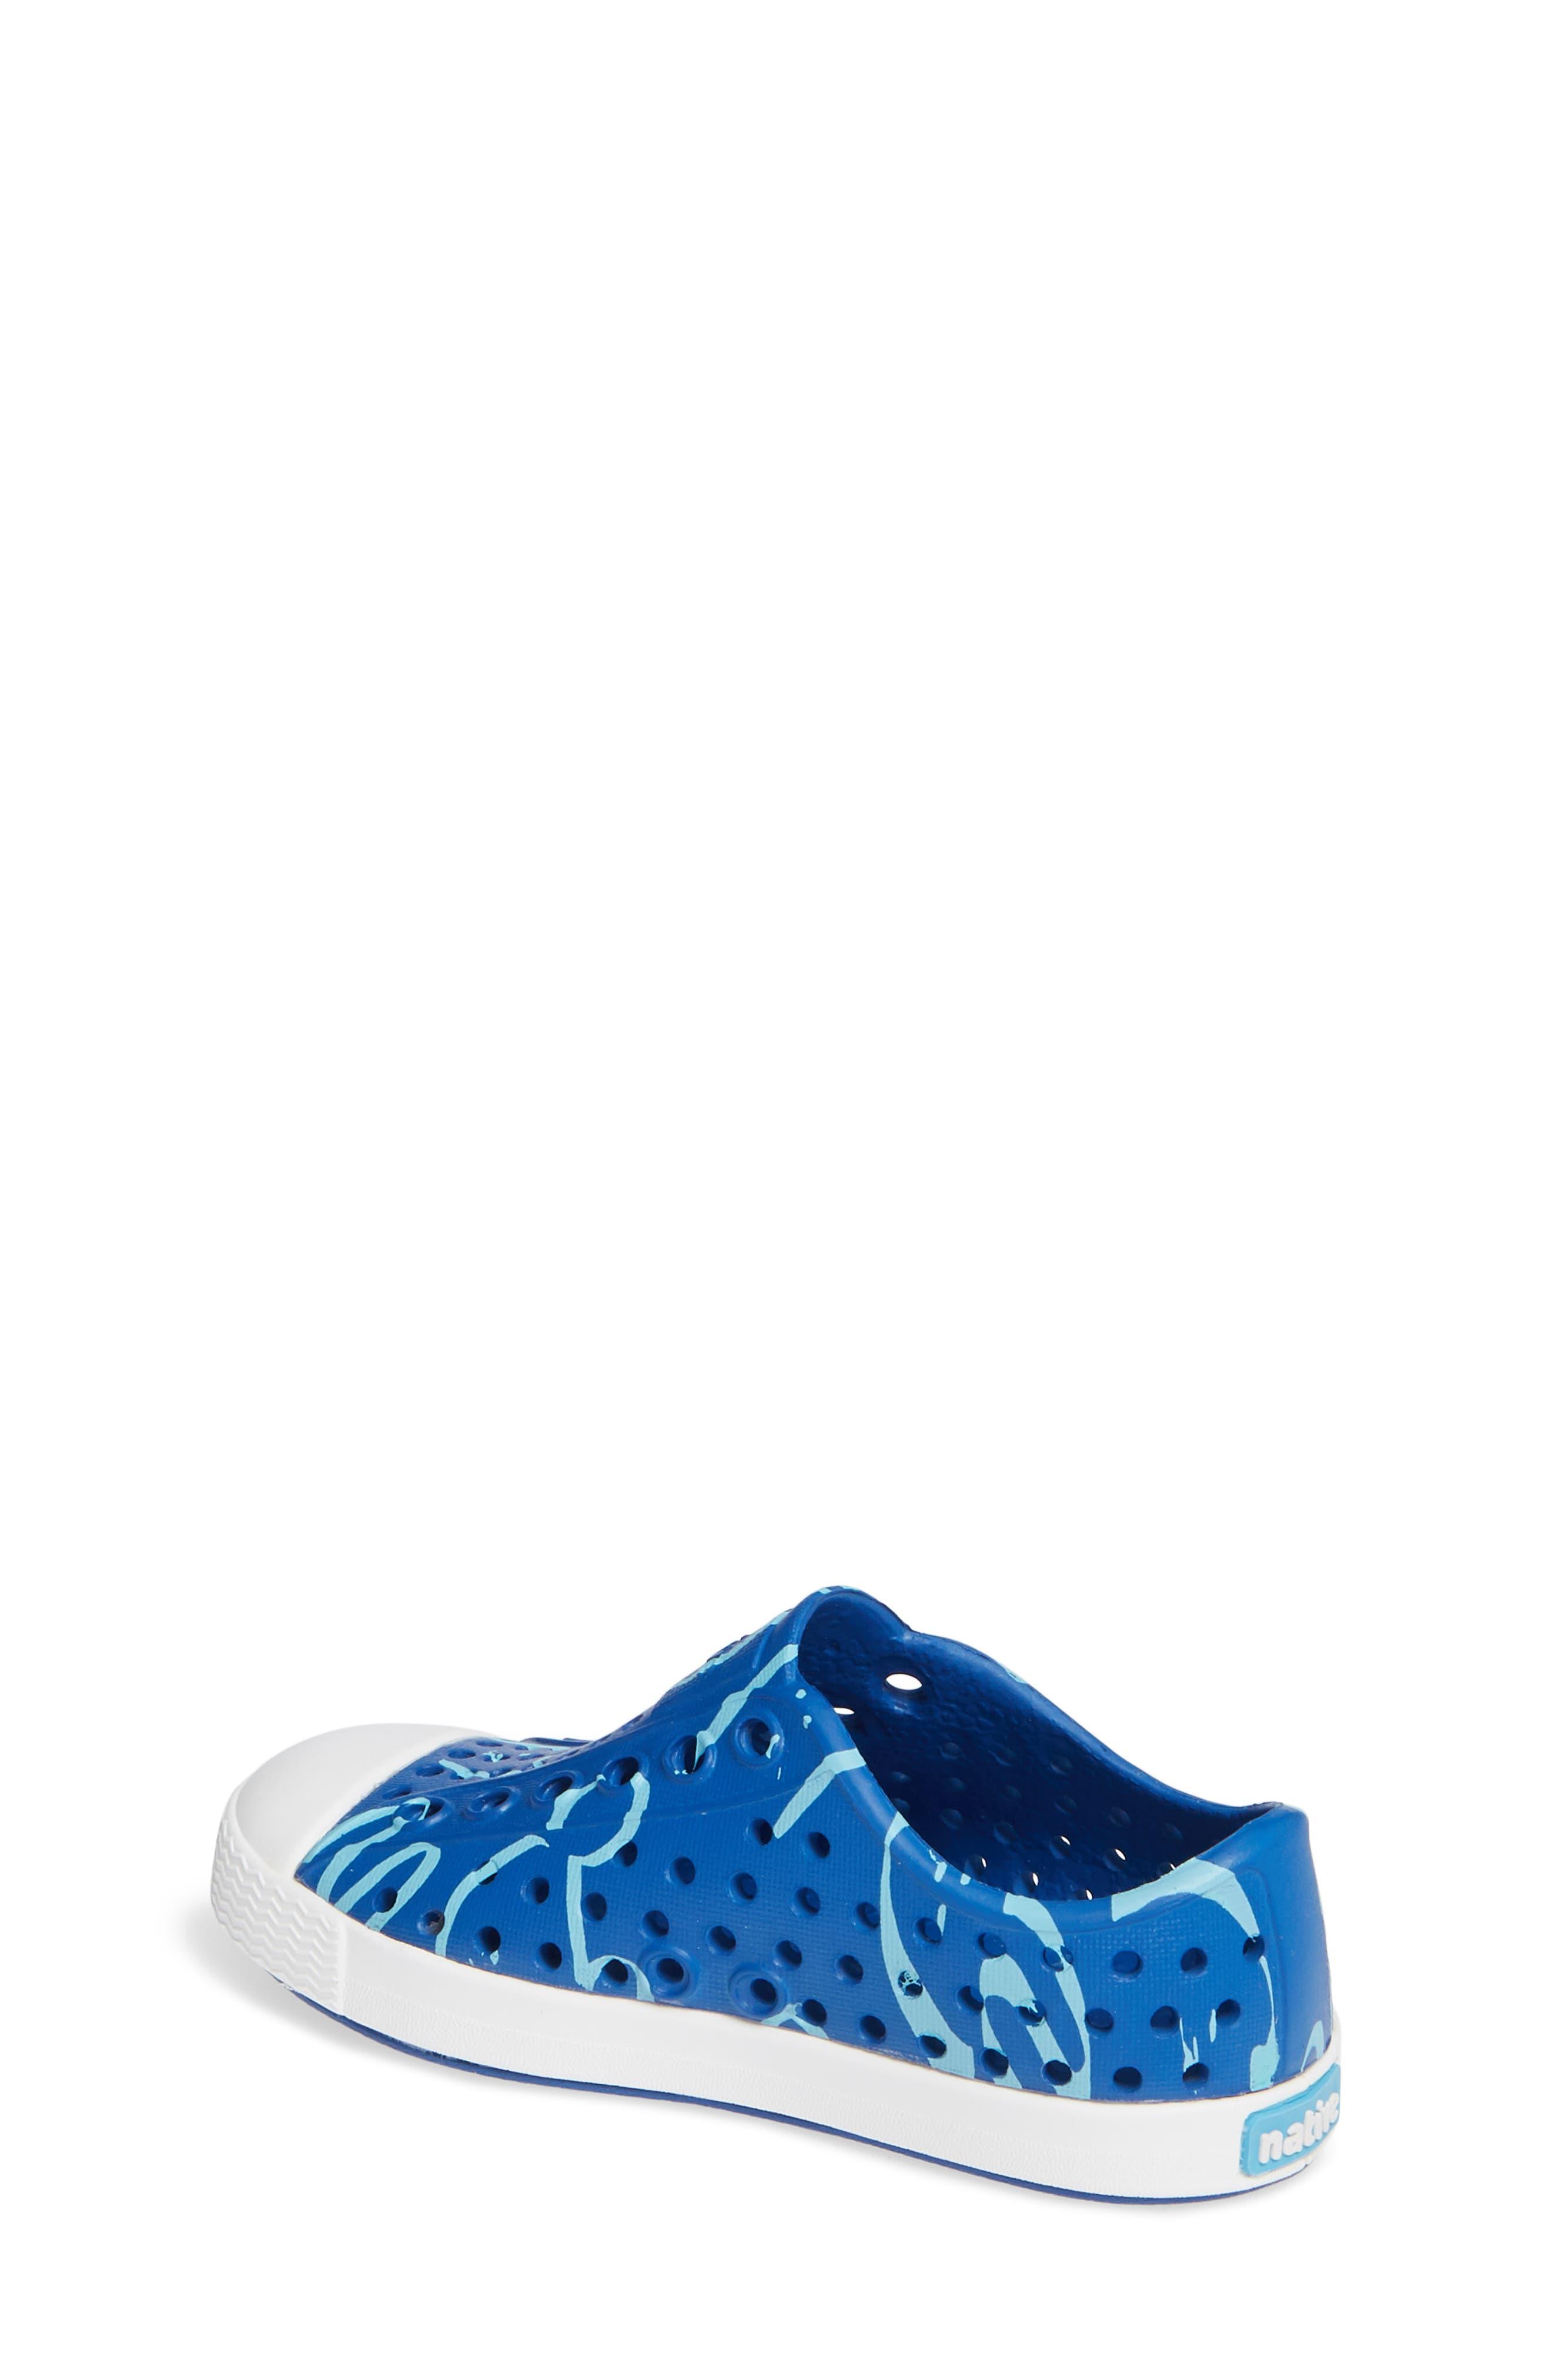 Jefferson Water Friendly Slip-On Shoe,                             Alternate thumbnail 2, color,                             VICTORIA BLUE/ WHITE ANIMALIA